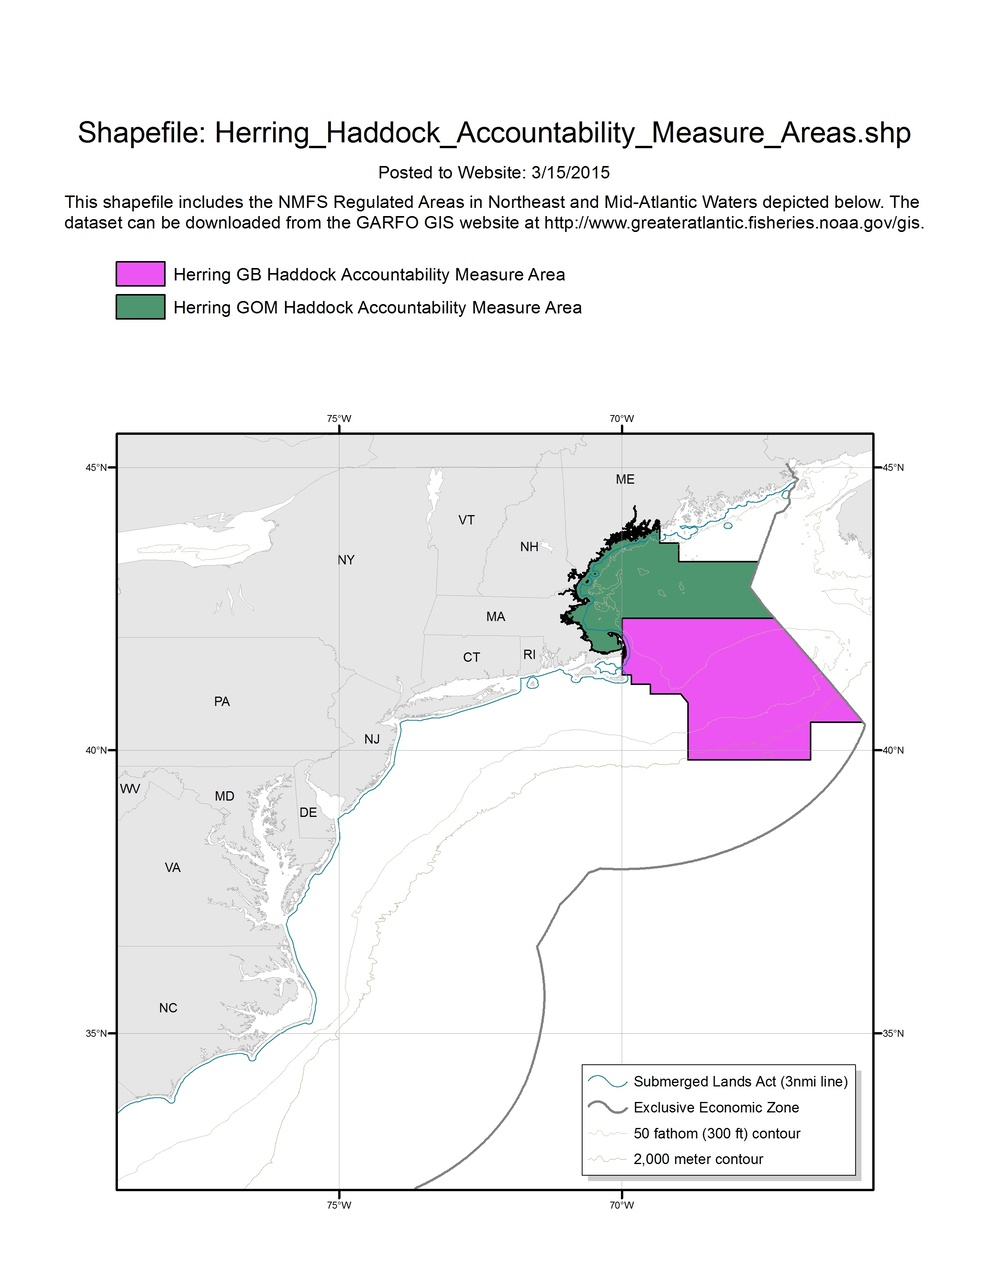 Herring-Haddock-Accountability-Measure-Areas-MAP-NOAA-GARFO.jpg